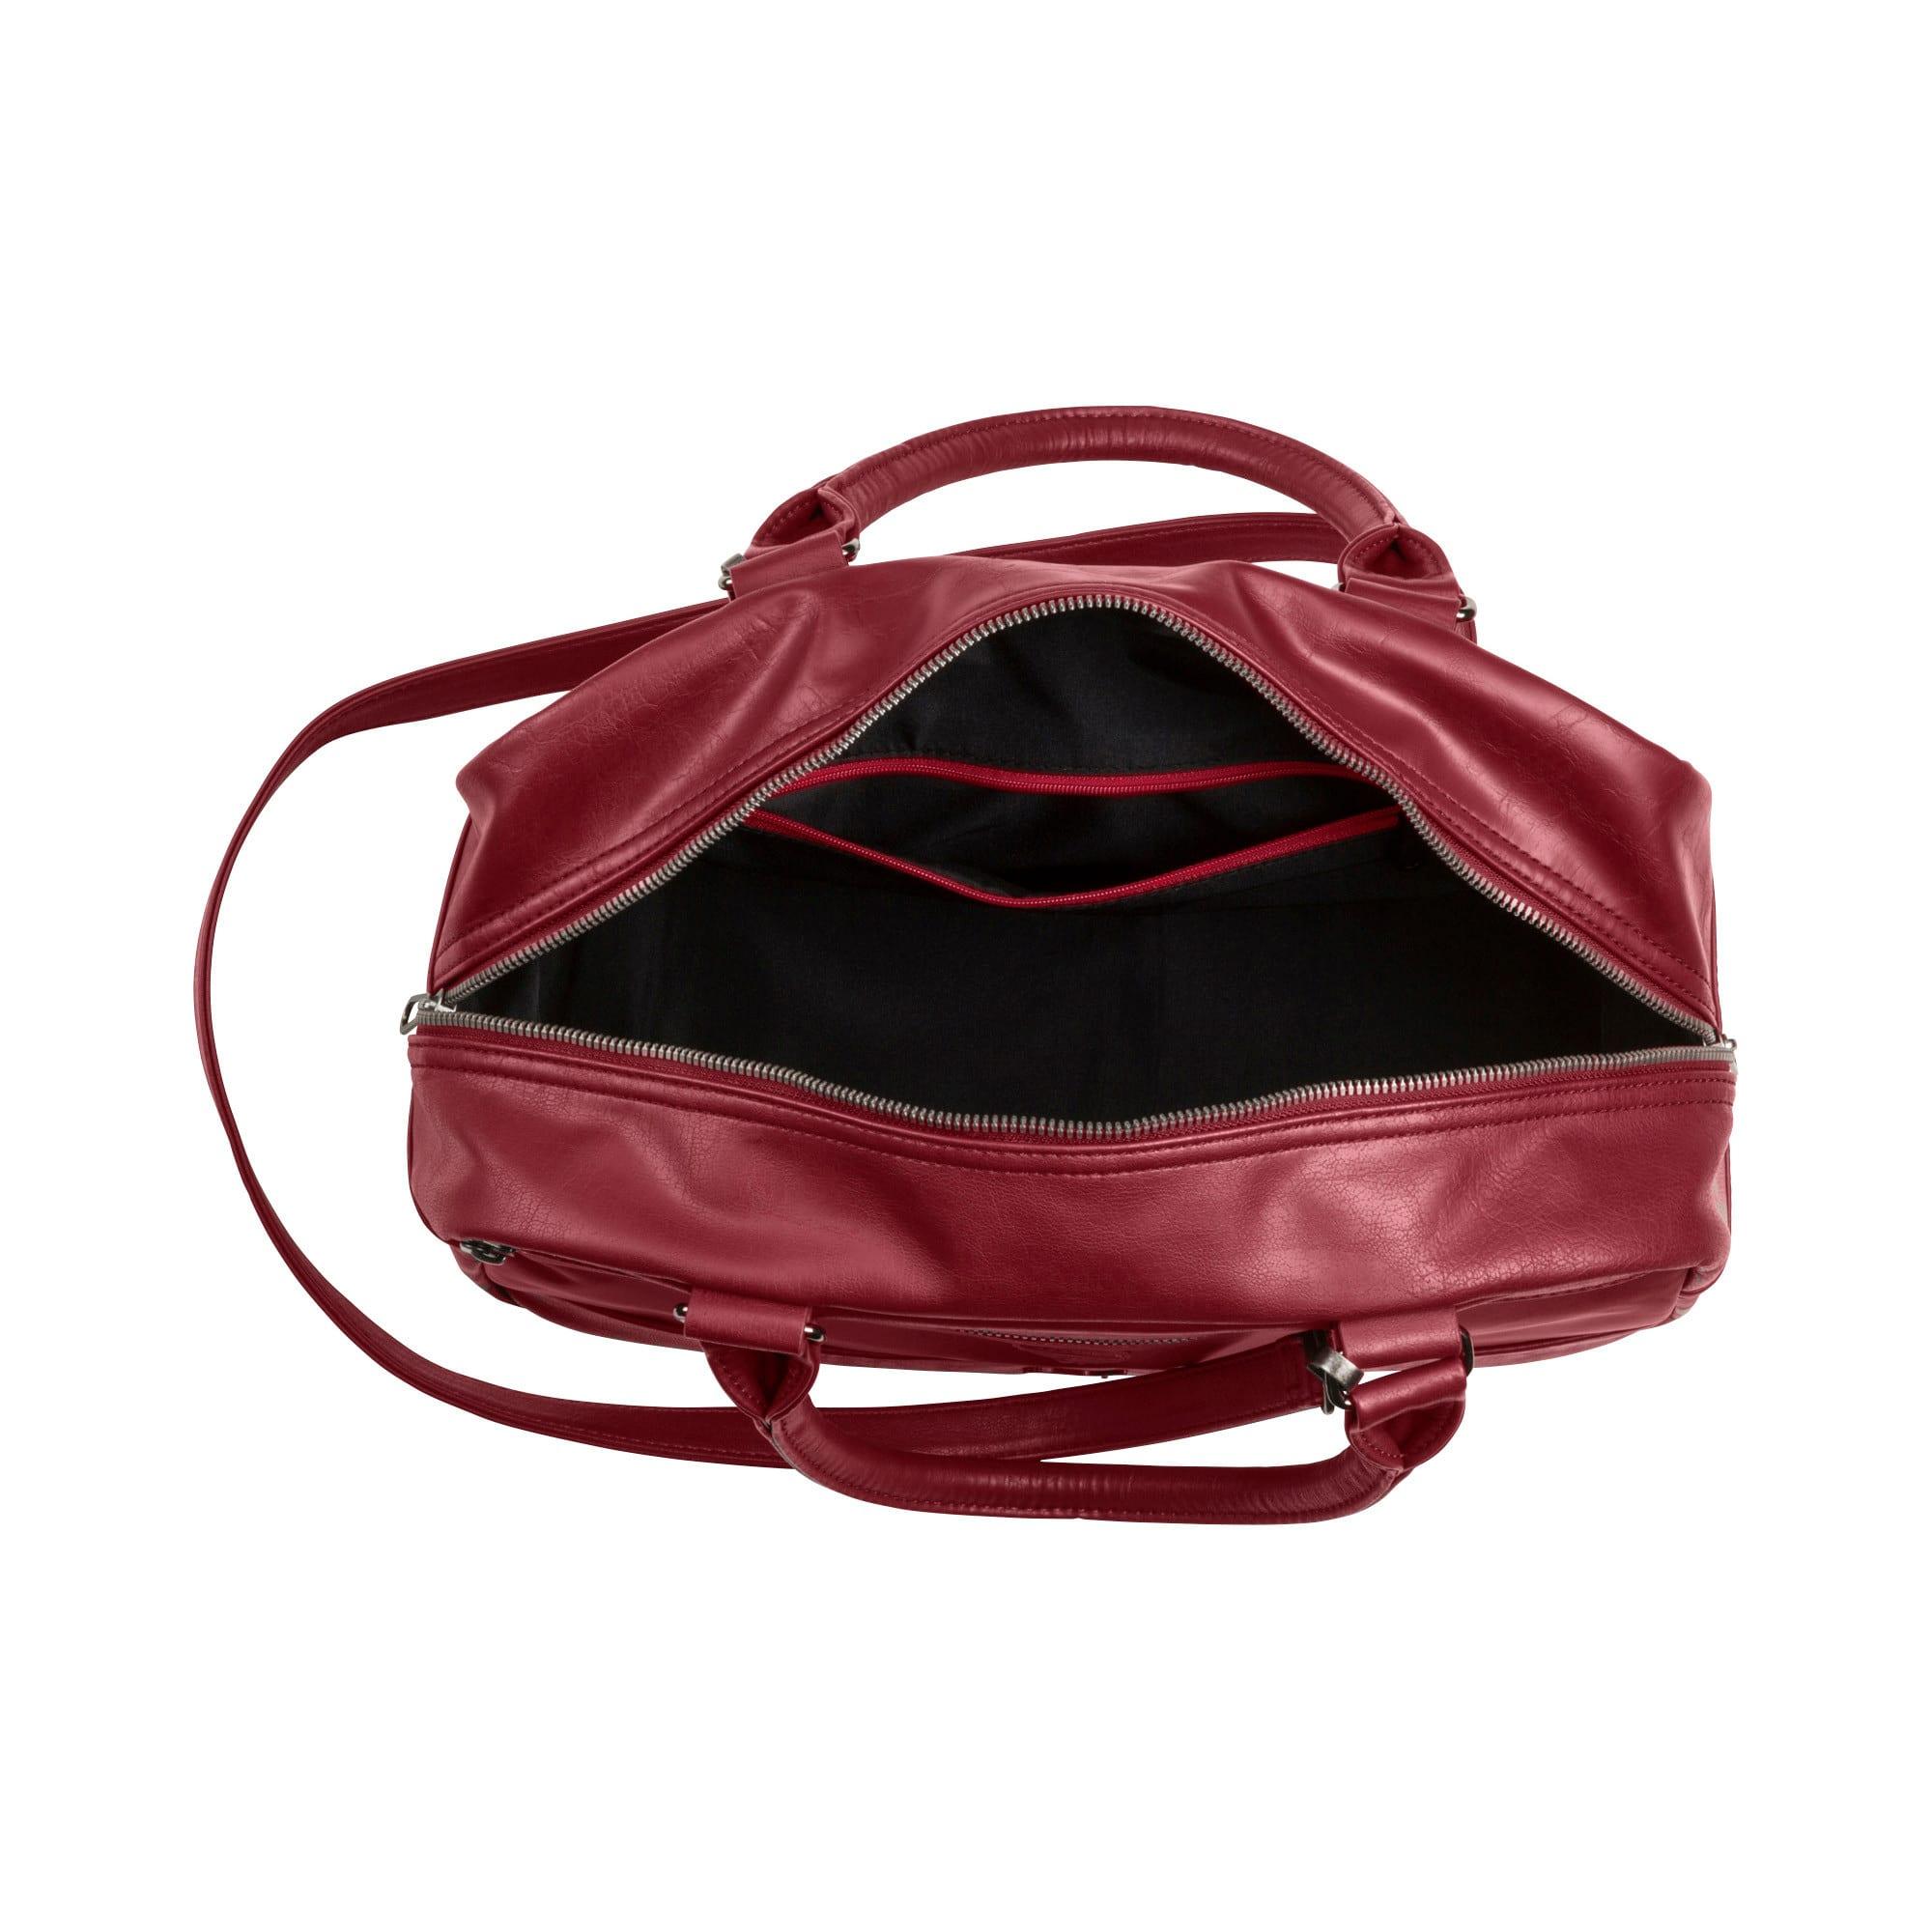 Thumbnail 3 of SF LS Handbag Puma Black, Pomegranate, medium-IND